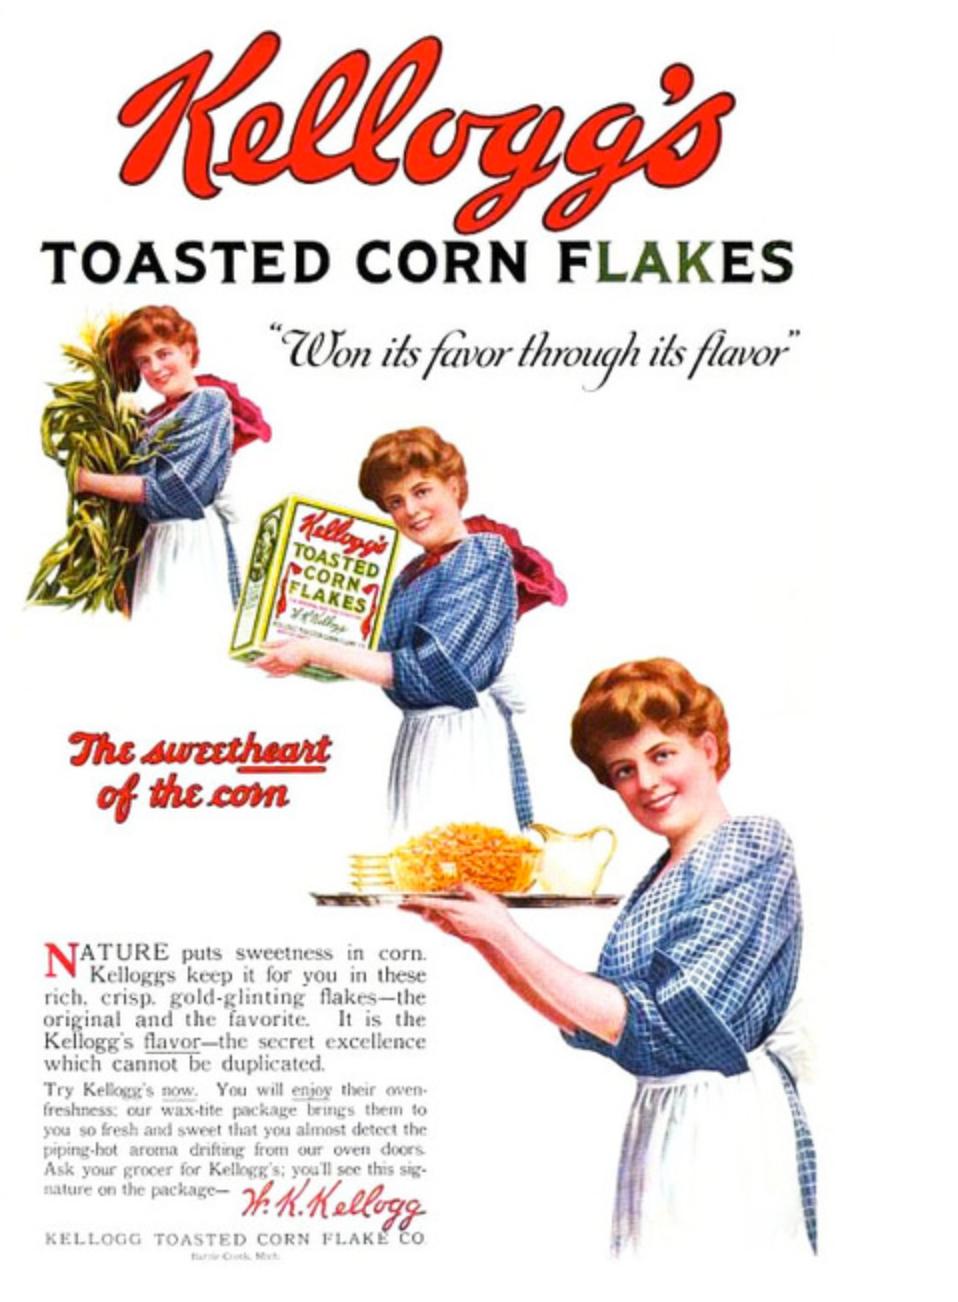 food: kellogg's toasted corn flakes (1919) | advertisements 1900